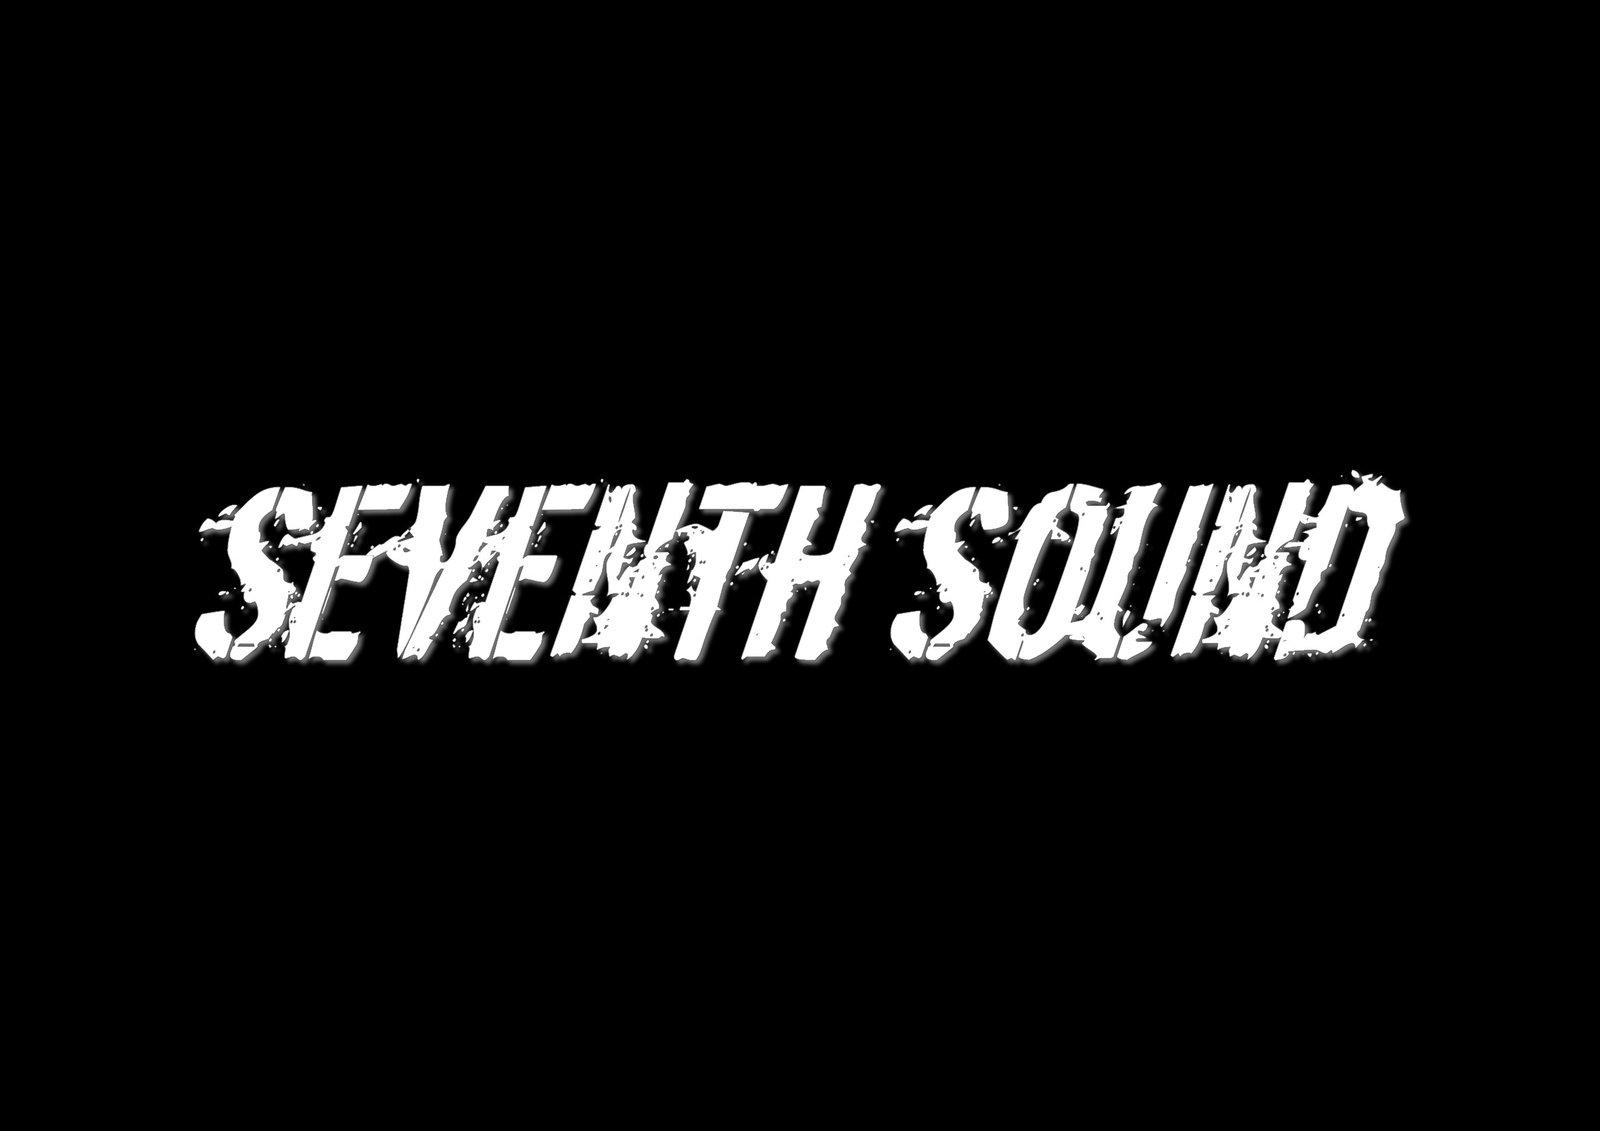 Seventh Sound